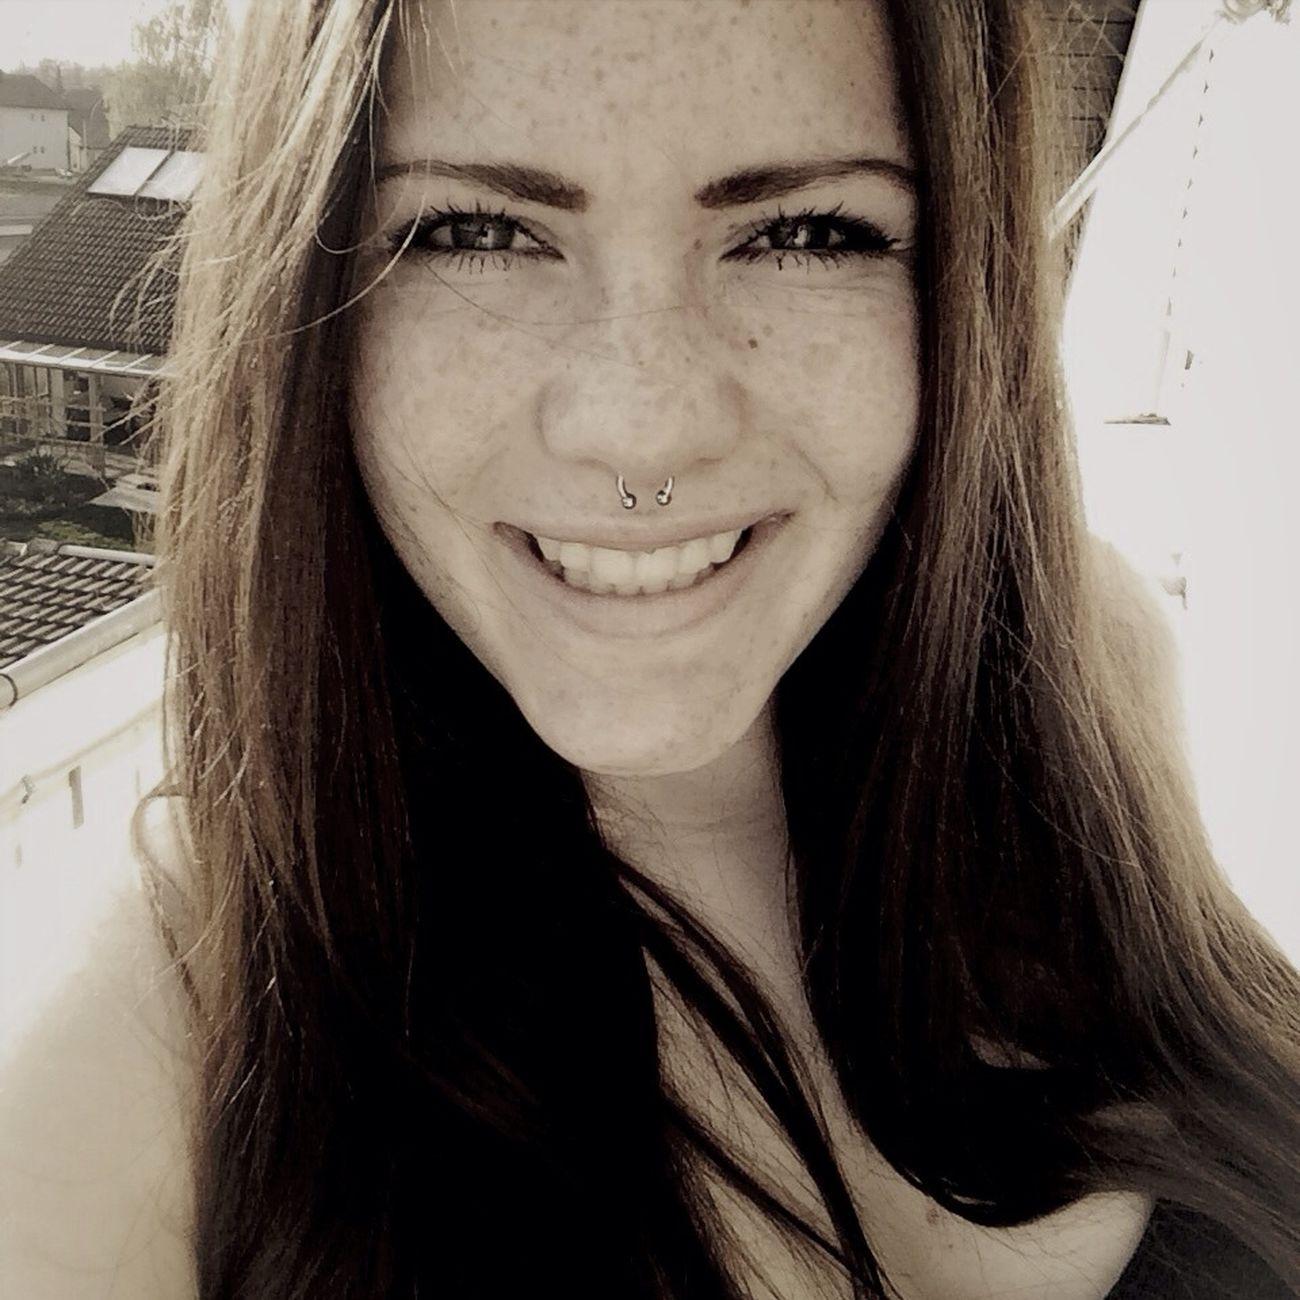 - smile - First Eyeem Photo